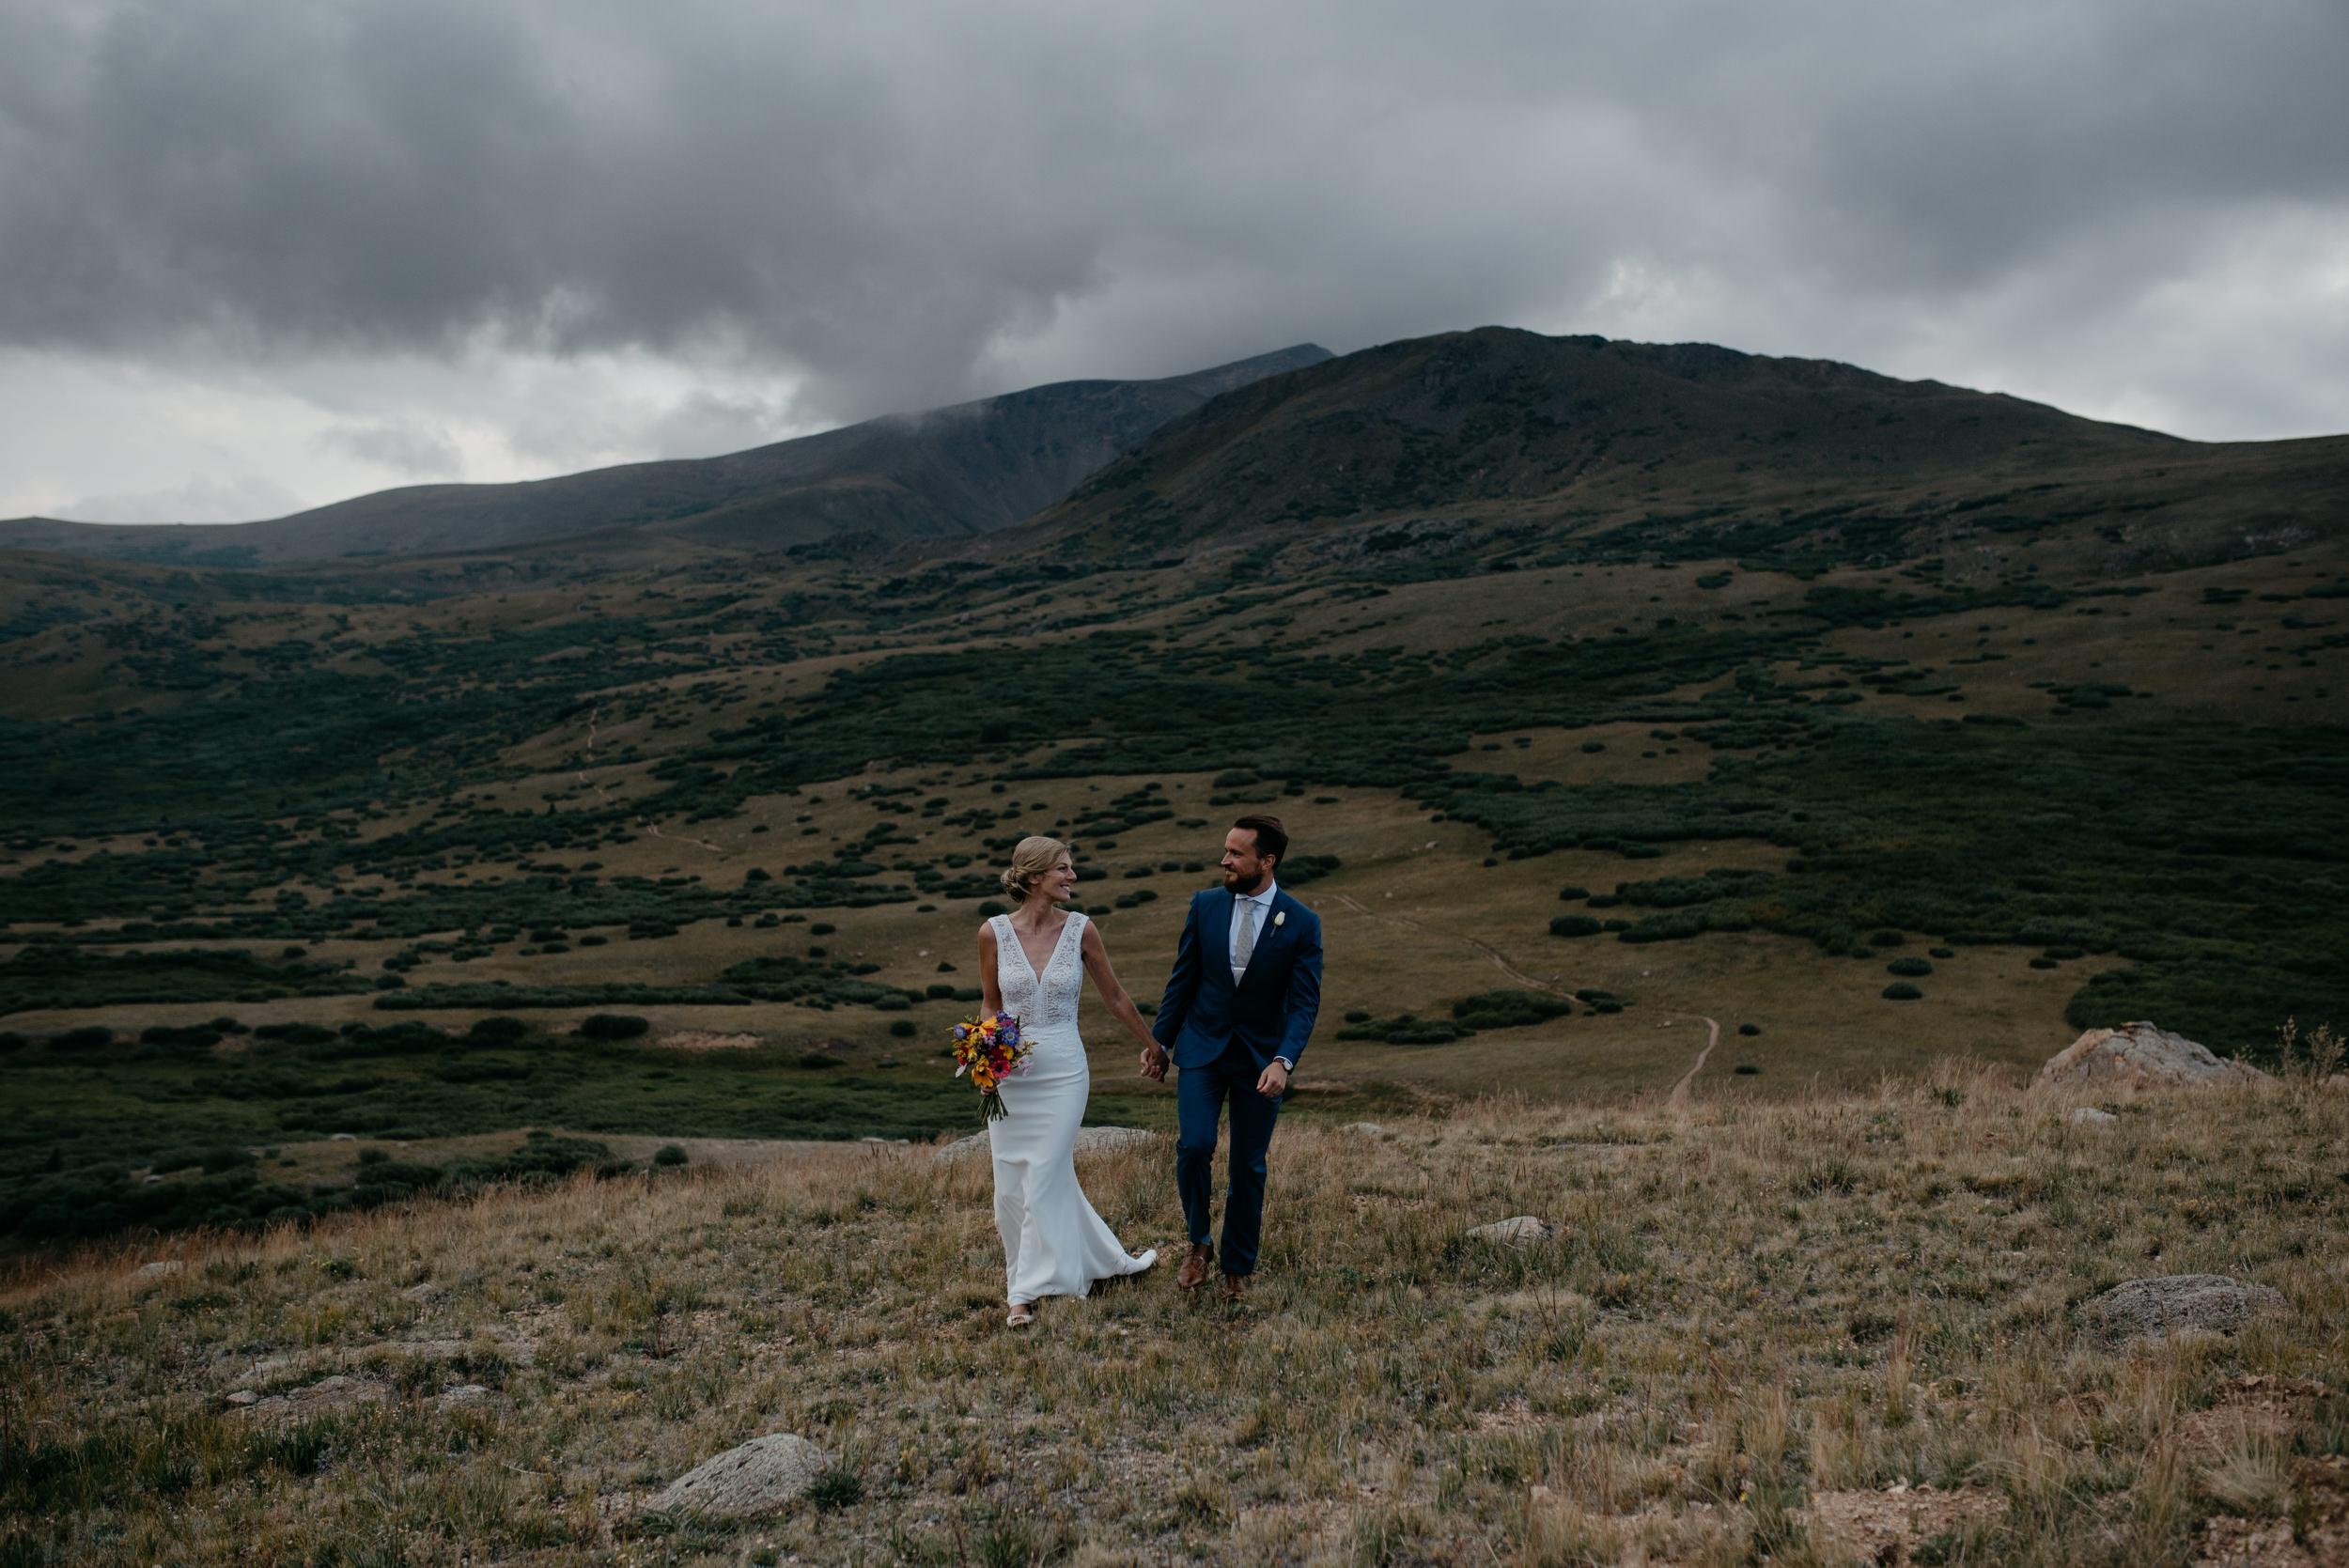 Alyssa Reinhold, Colorado based wedding and elopement photographer